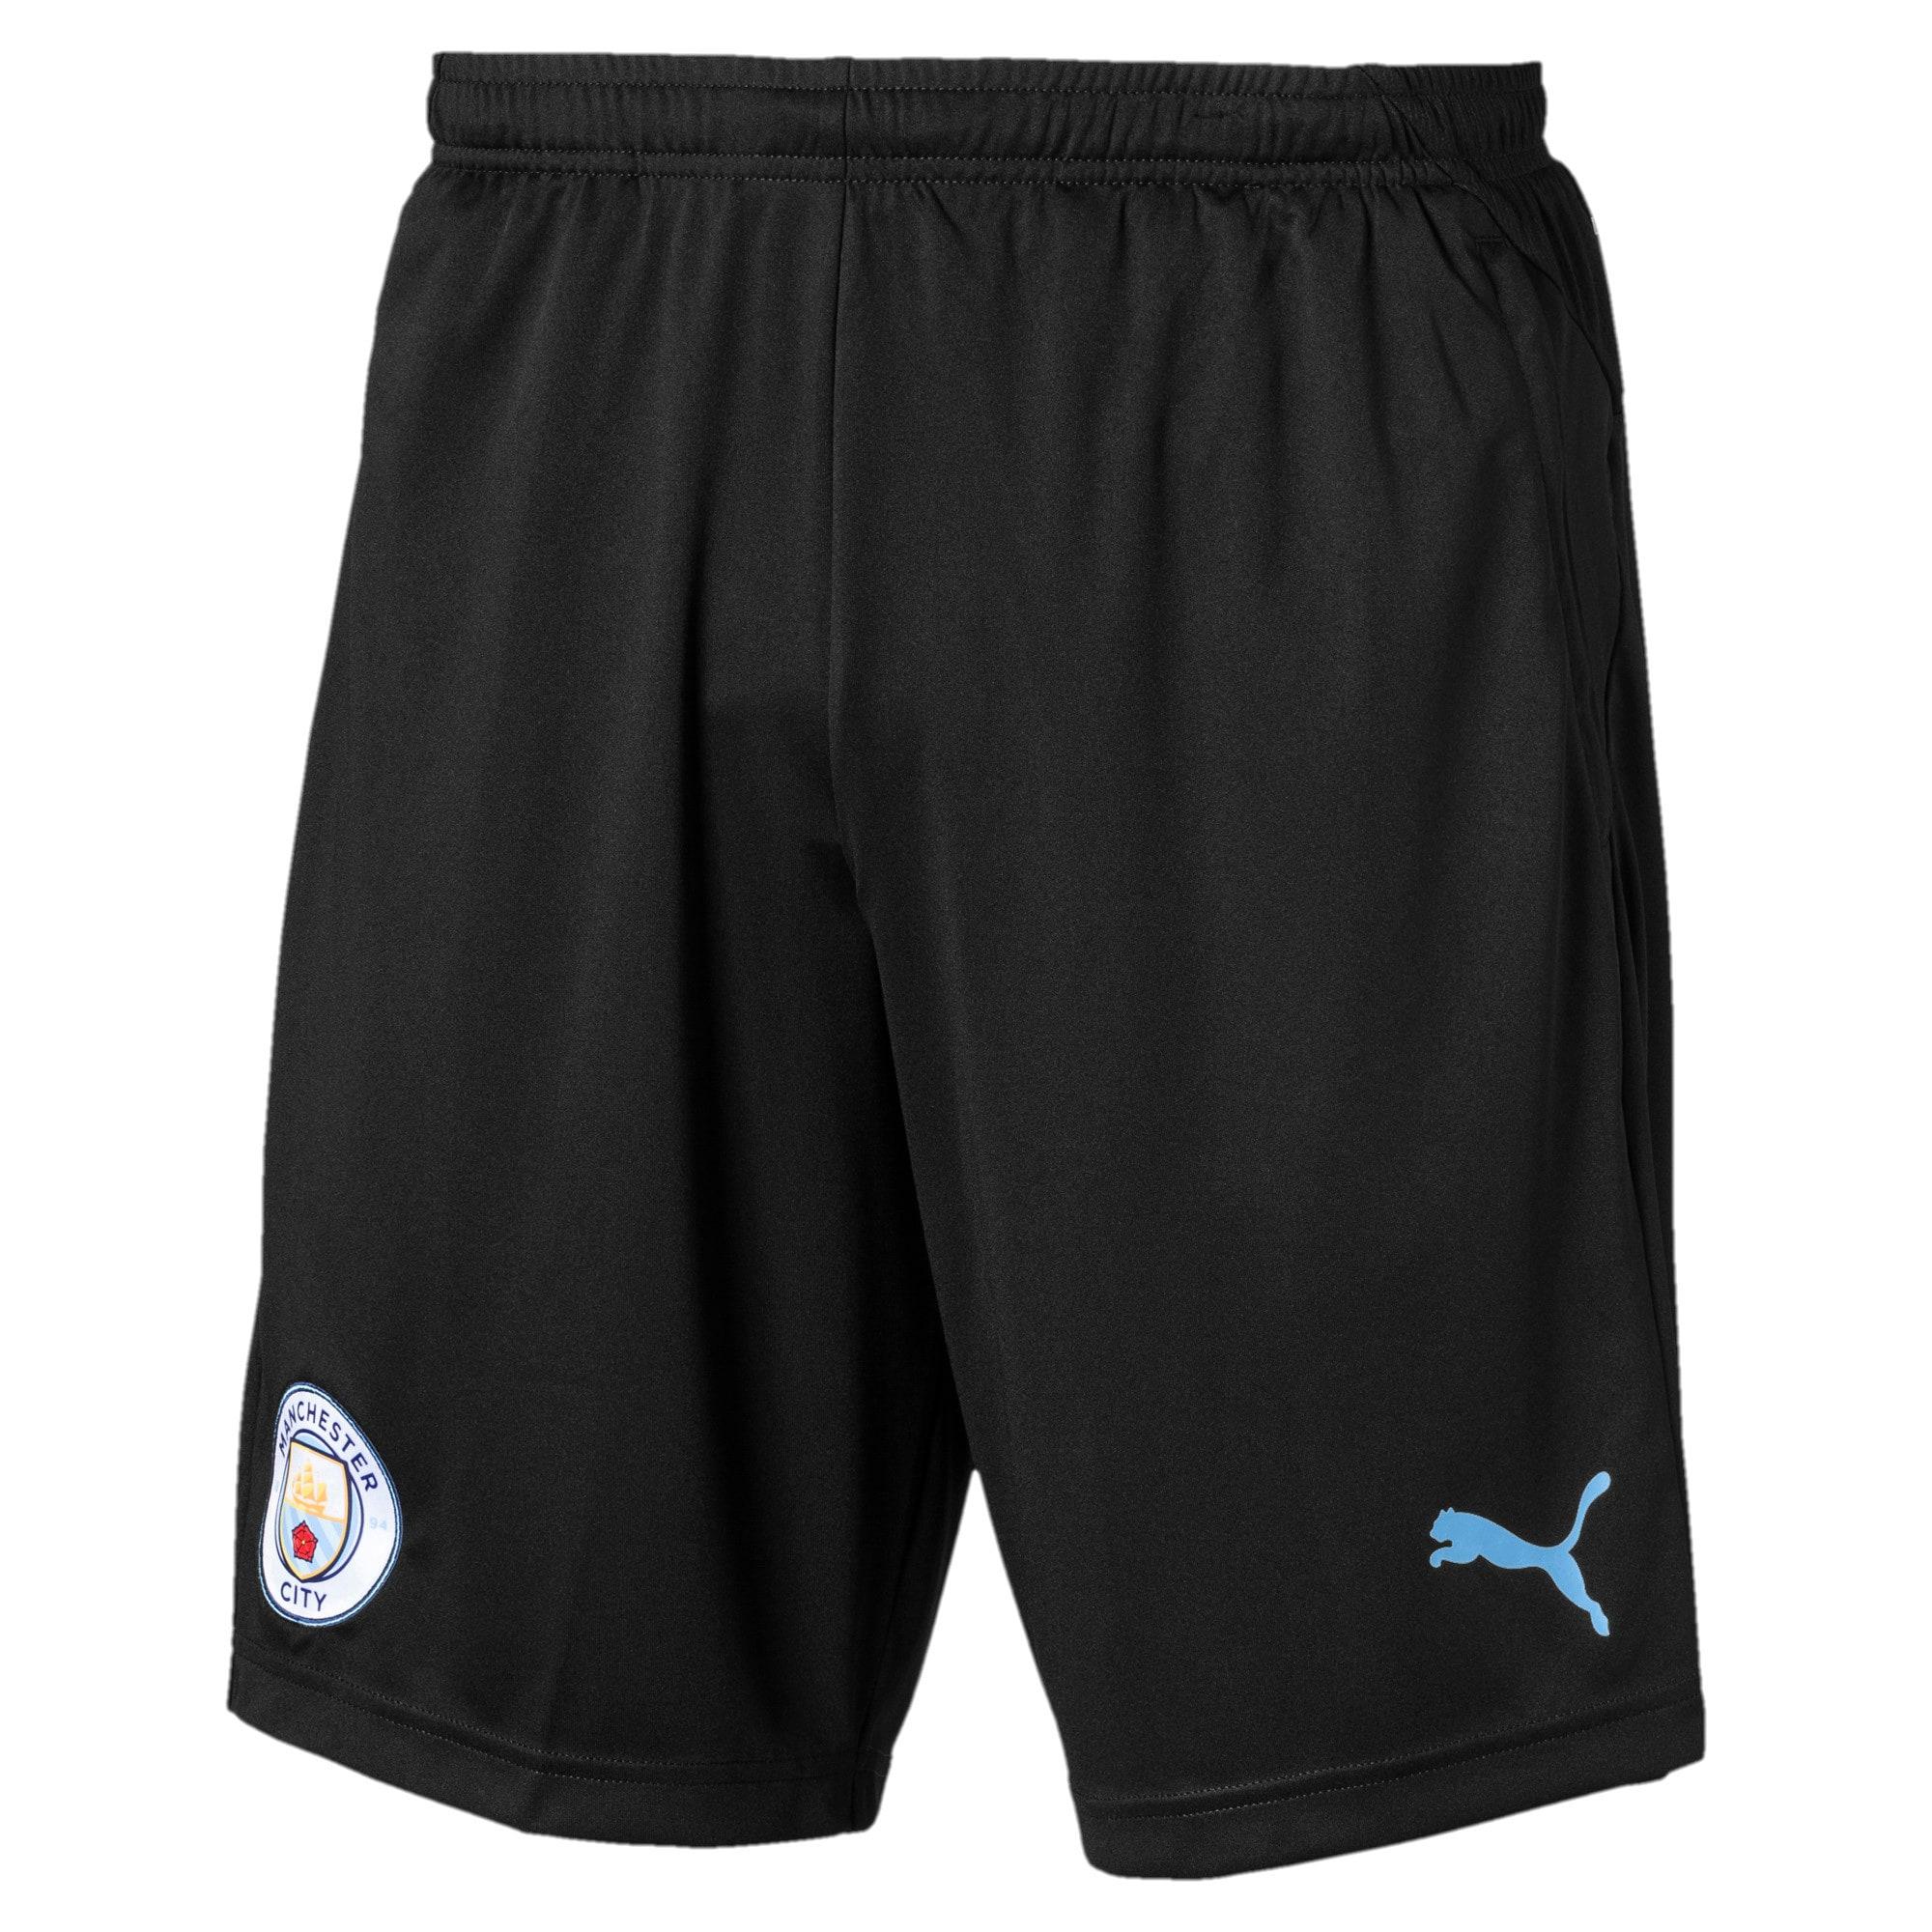 Thumbnail 4 of Manchester City FC Men's Training Shorts, Puma Black-Team Light Blue, medium